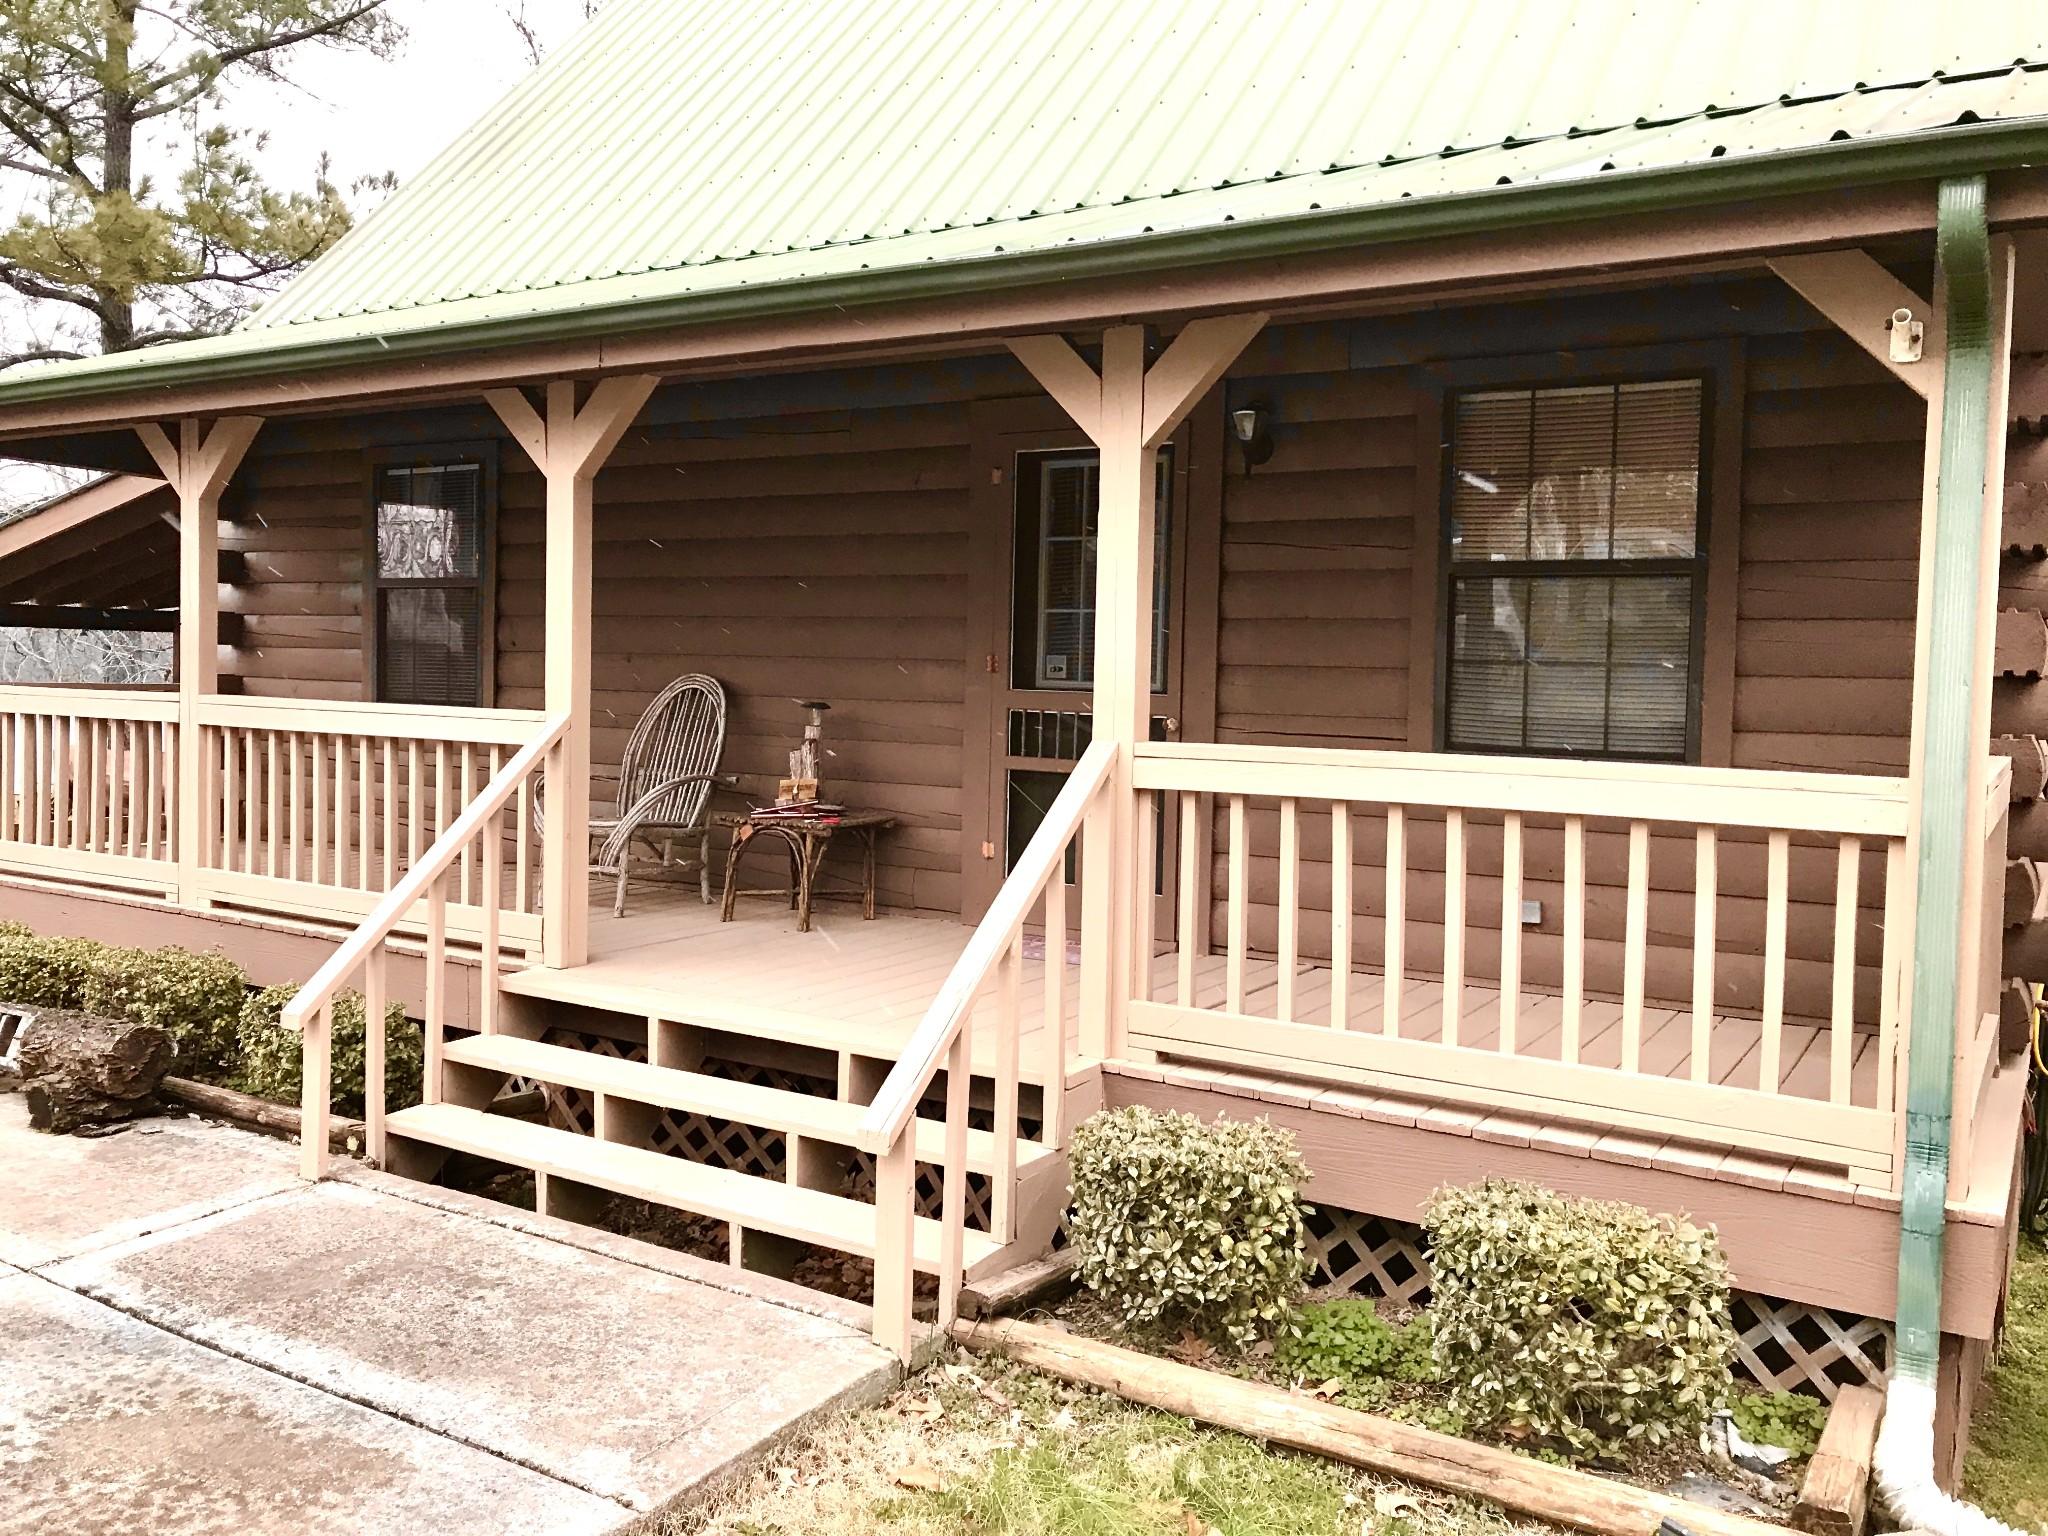 208 Lakeshore Dr, Dover, TN 37058 - Dover, TN real estate listing